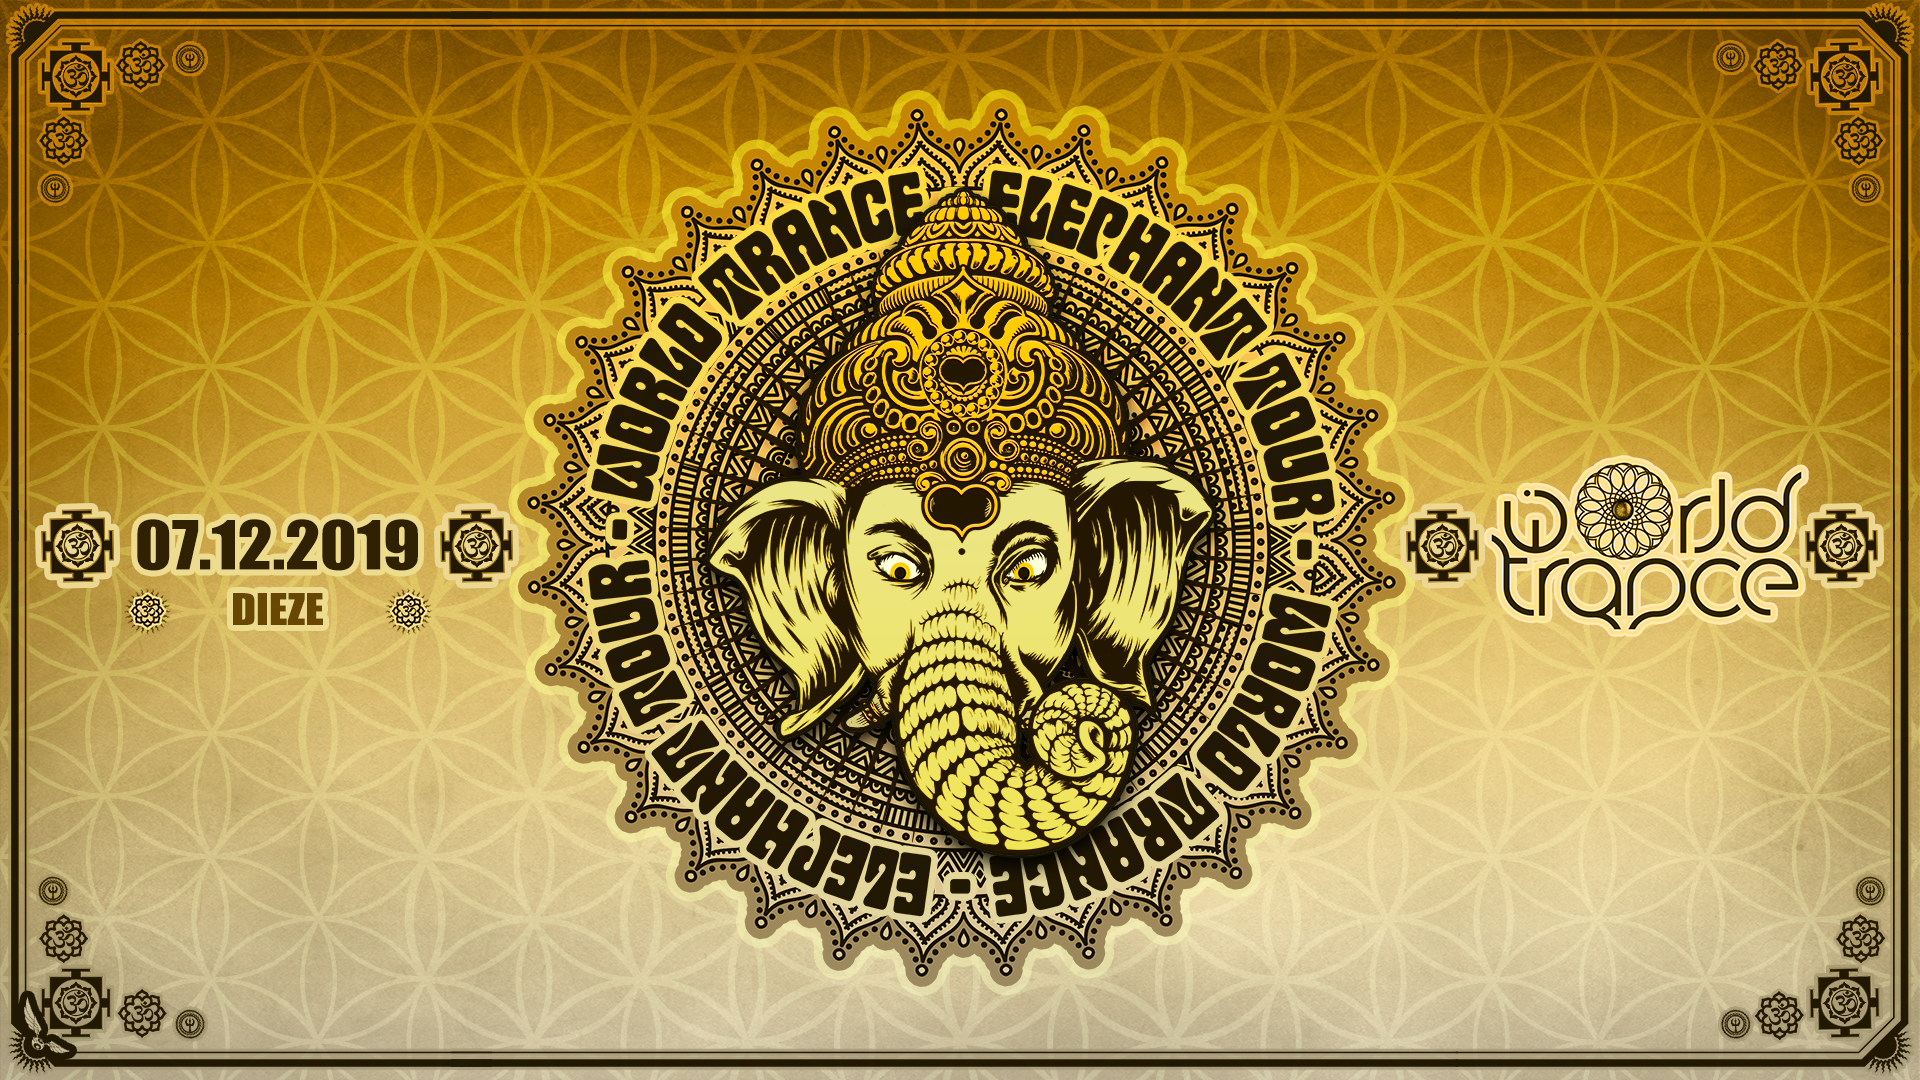 World Trance - Elephant Tour w/ Undercover, Hammerer, Unlogix, Kalki Dieze